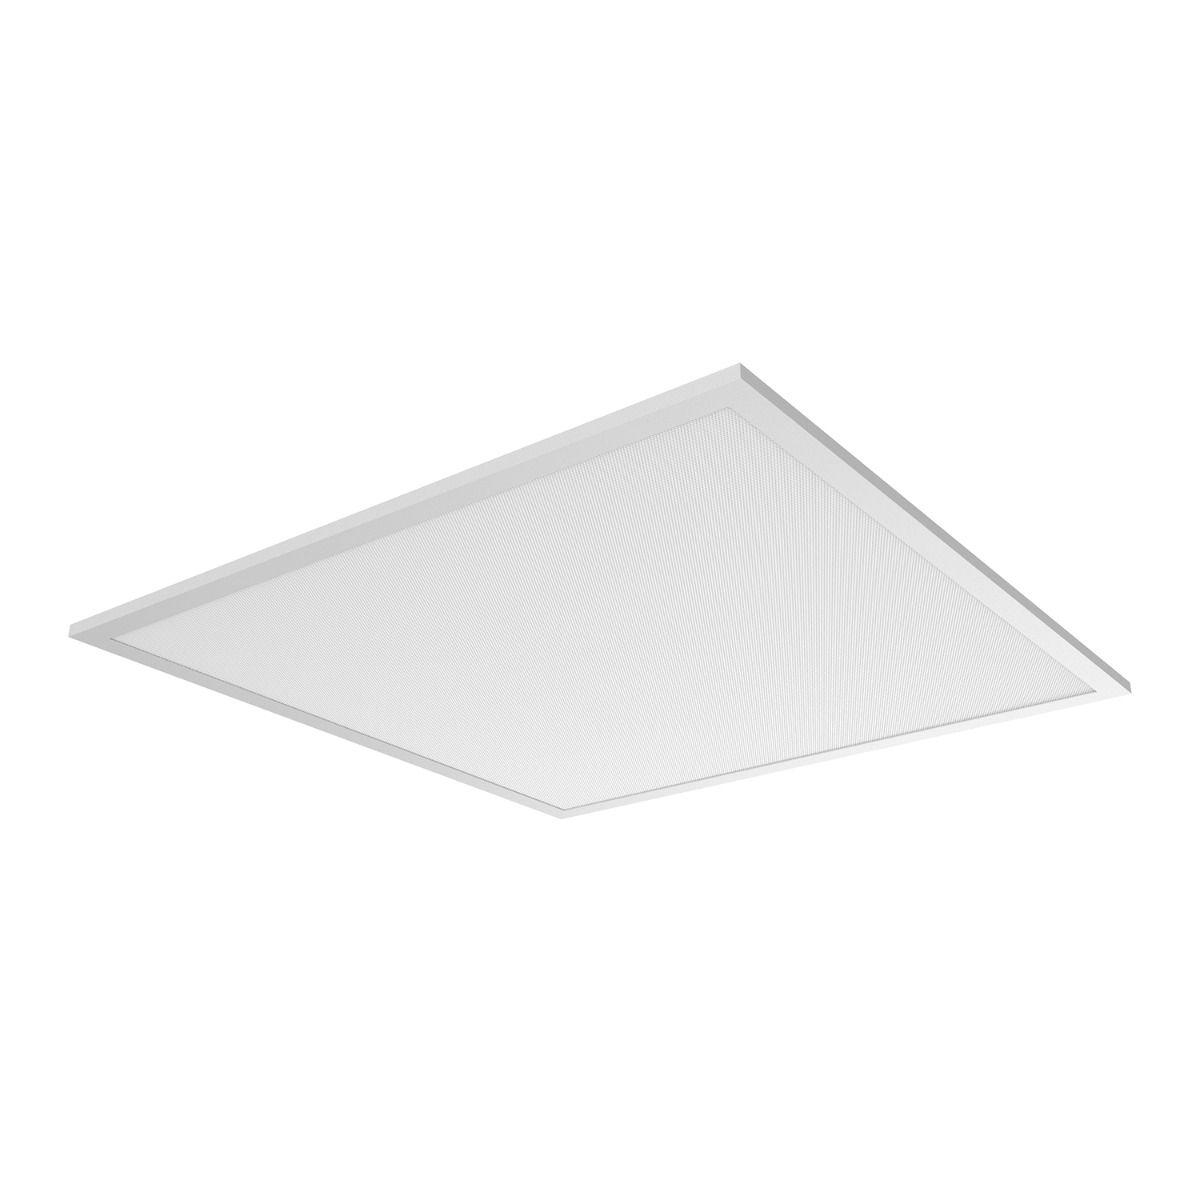 Noxion LED Panel Delta Pro V3 Highlum DALI 36W 3000K 5225lm 60x60cm UGR <19 | Varm Vit - Ersättare 4x18W